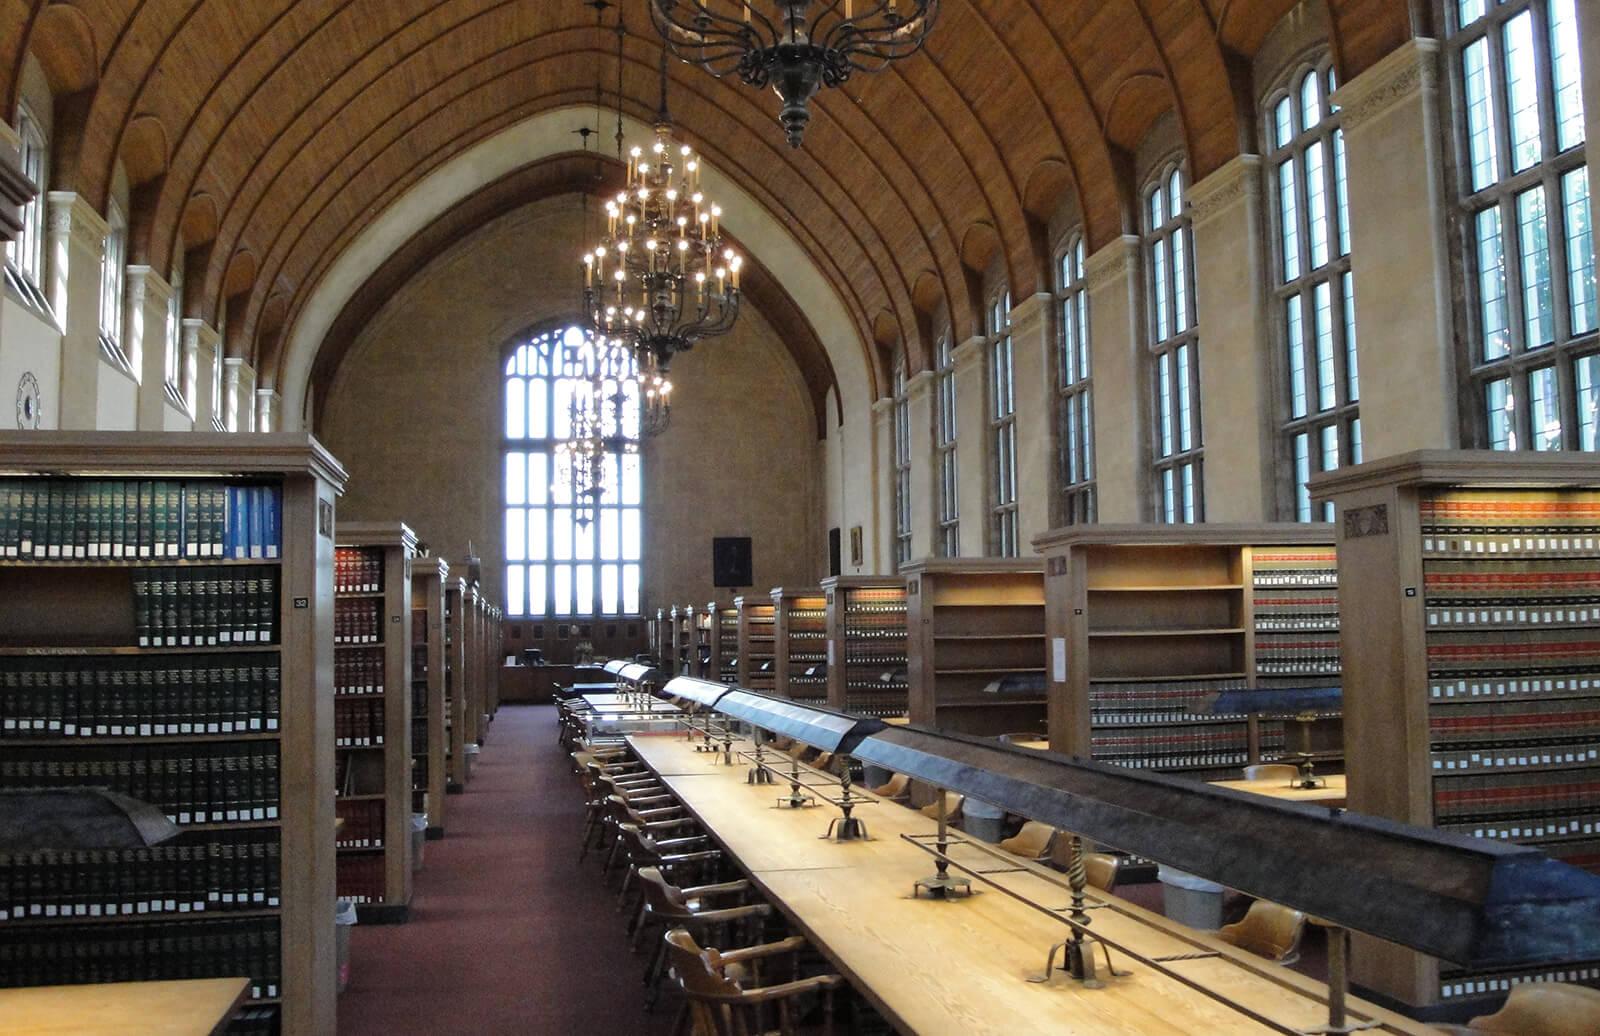 Cornell Law School Library, Ithaca, NY